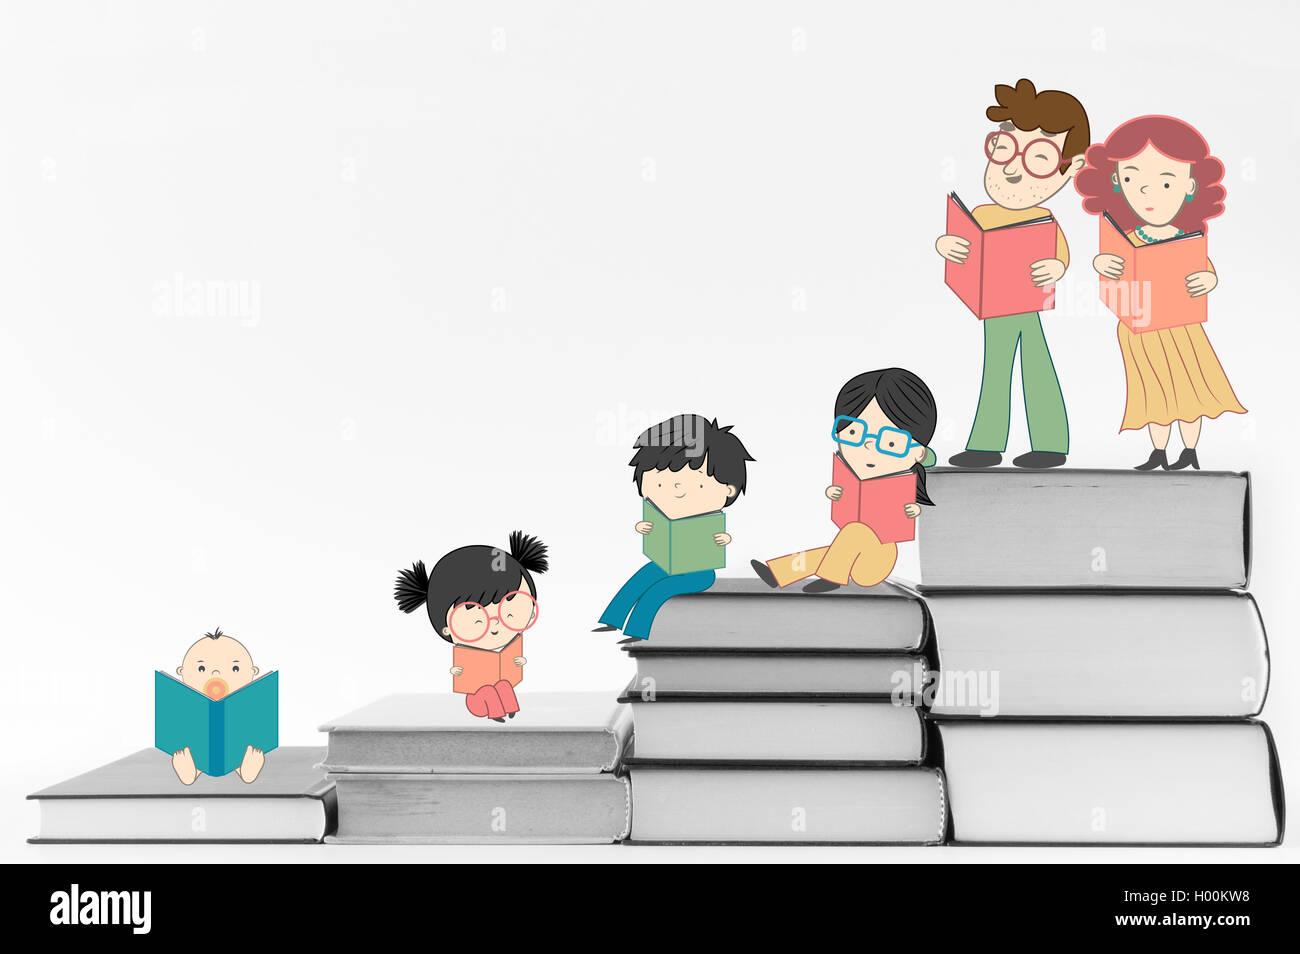 Illustration Children Reading Books Imágenes De Stock & Illustration ...